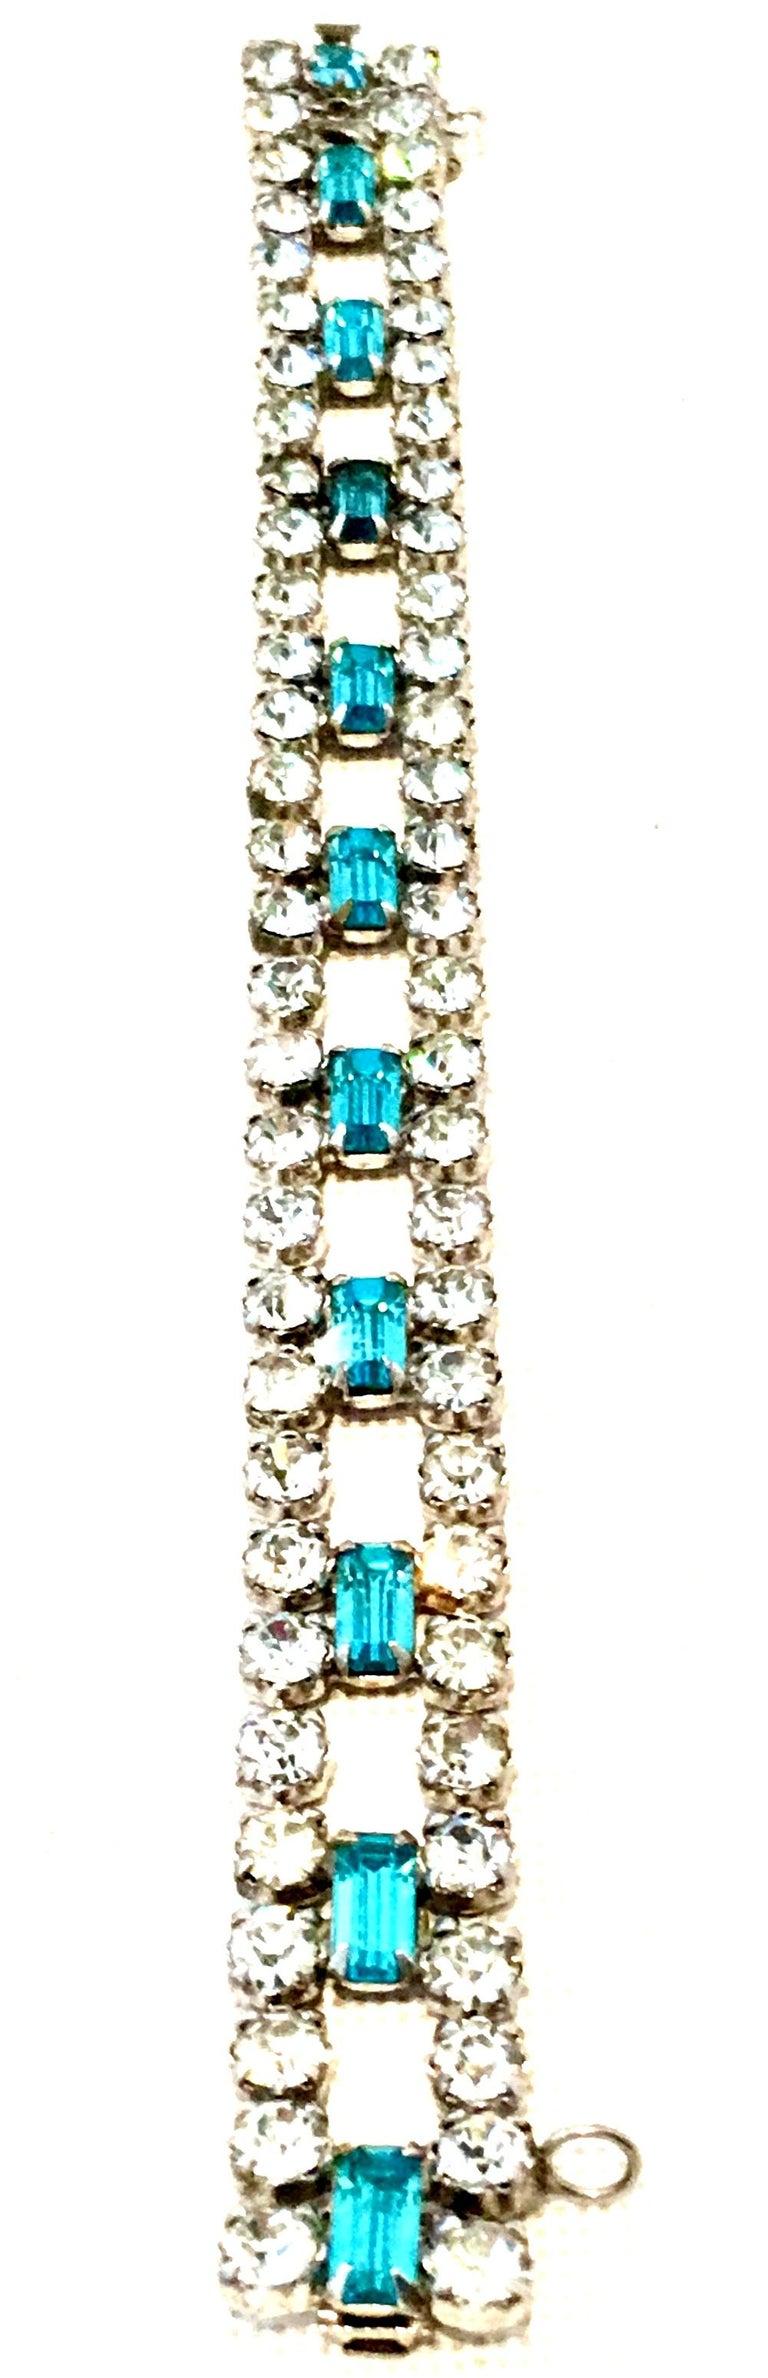 60'S Silver & Blue Sapphire Swarovski Crystal Rhineston Parure S/2 By, J Wiesner For Sale 3